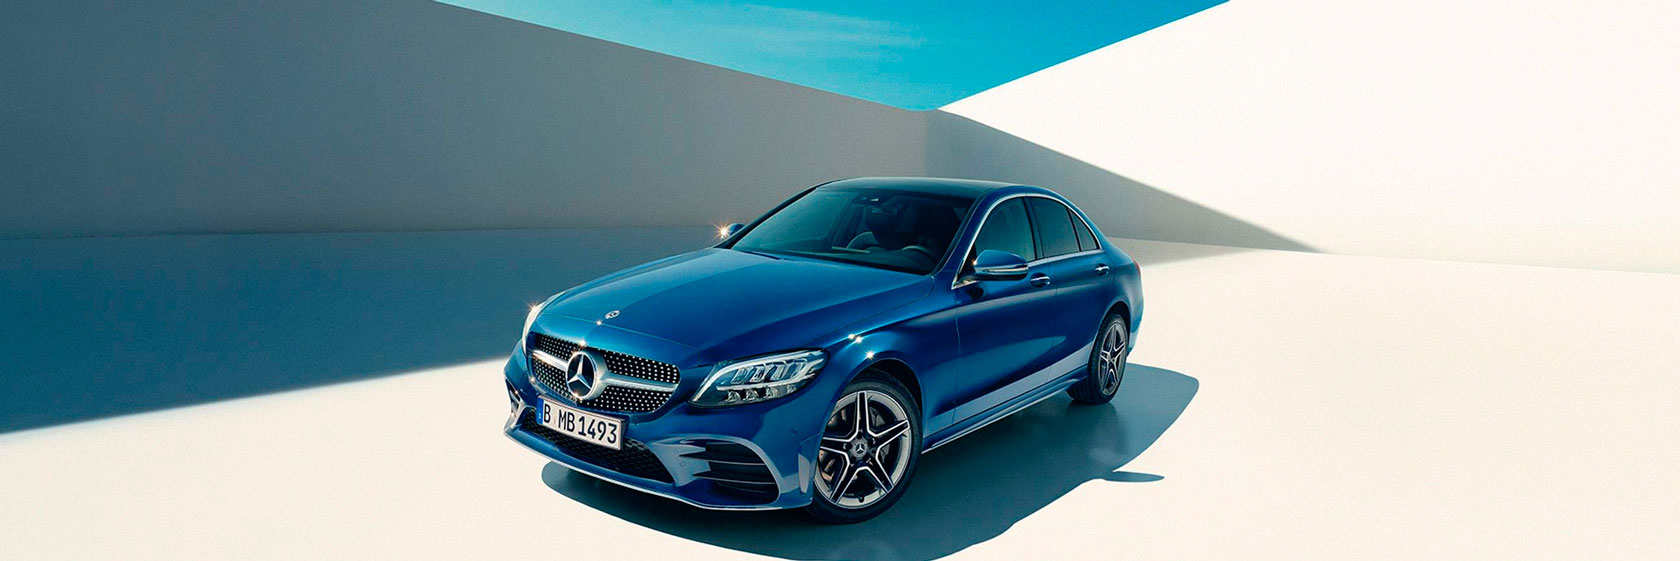 Ціна Mercedes–Benz C–Class Sedan